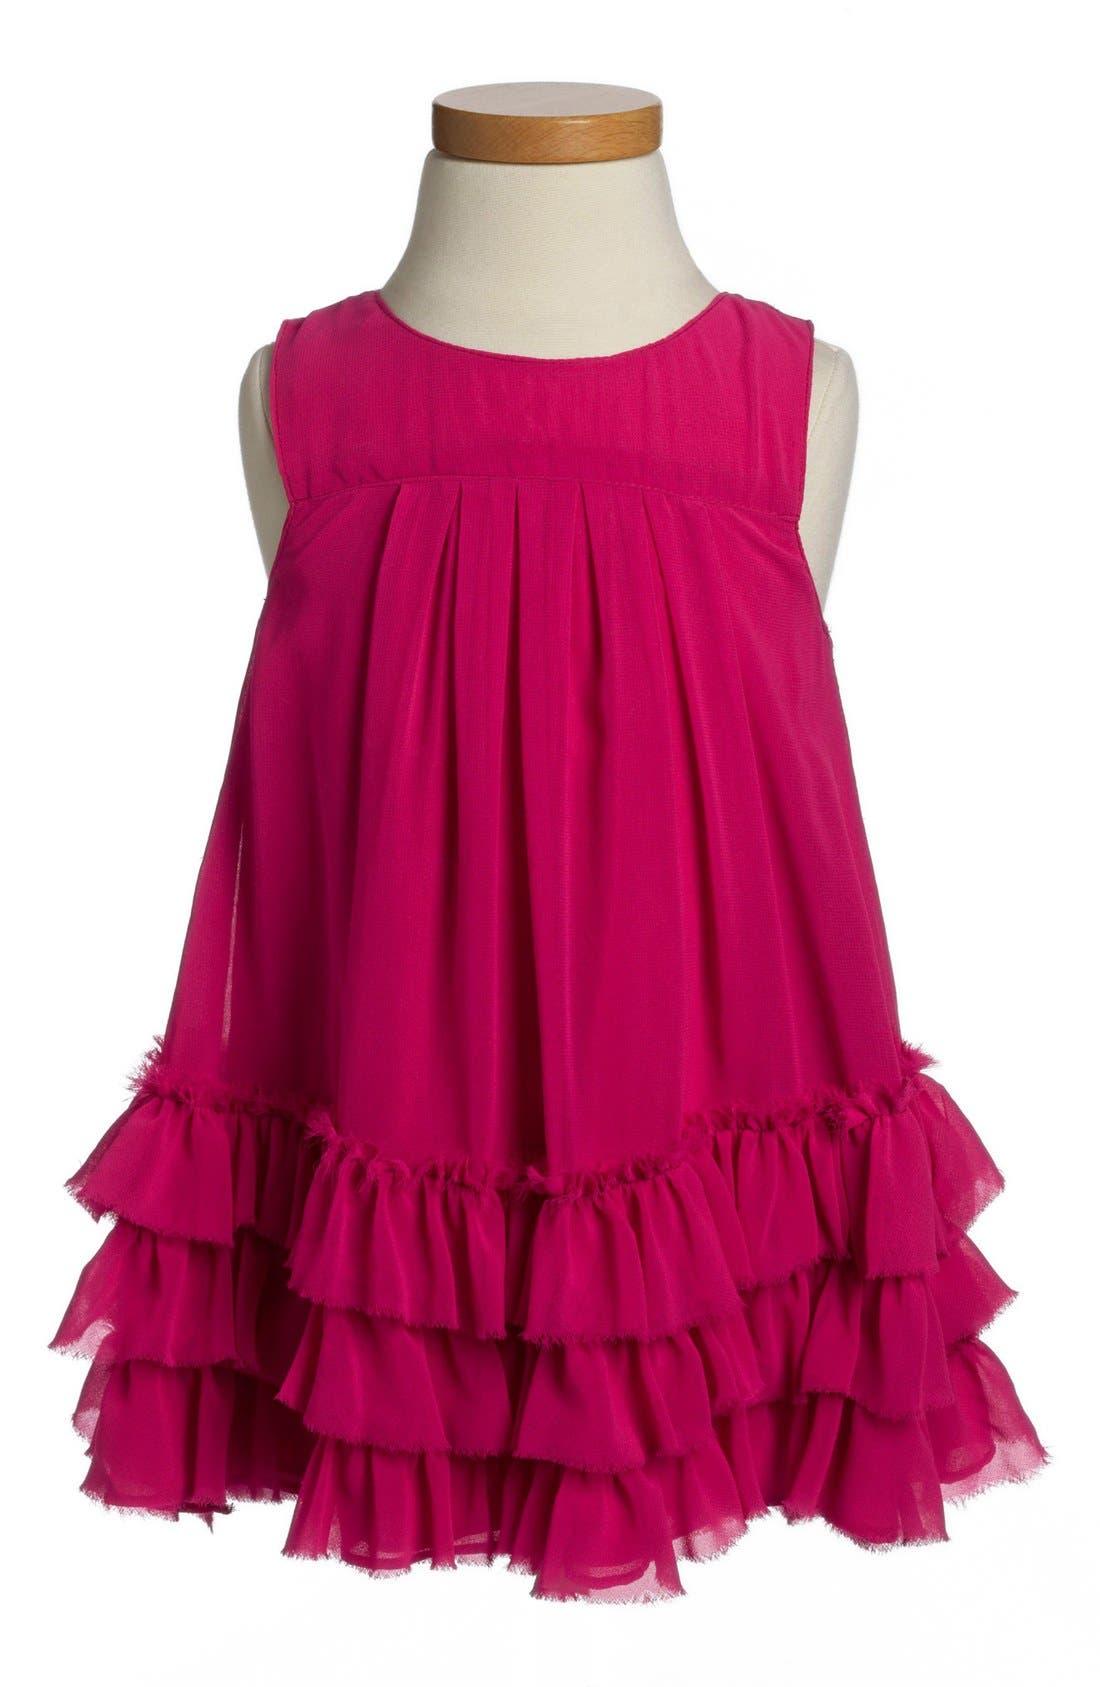 Main Image - Pippa & Julie Chiffon Dress (Toddler Girls)